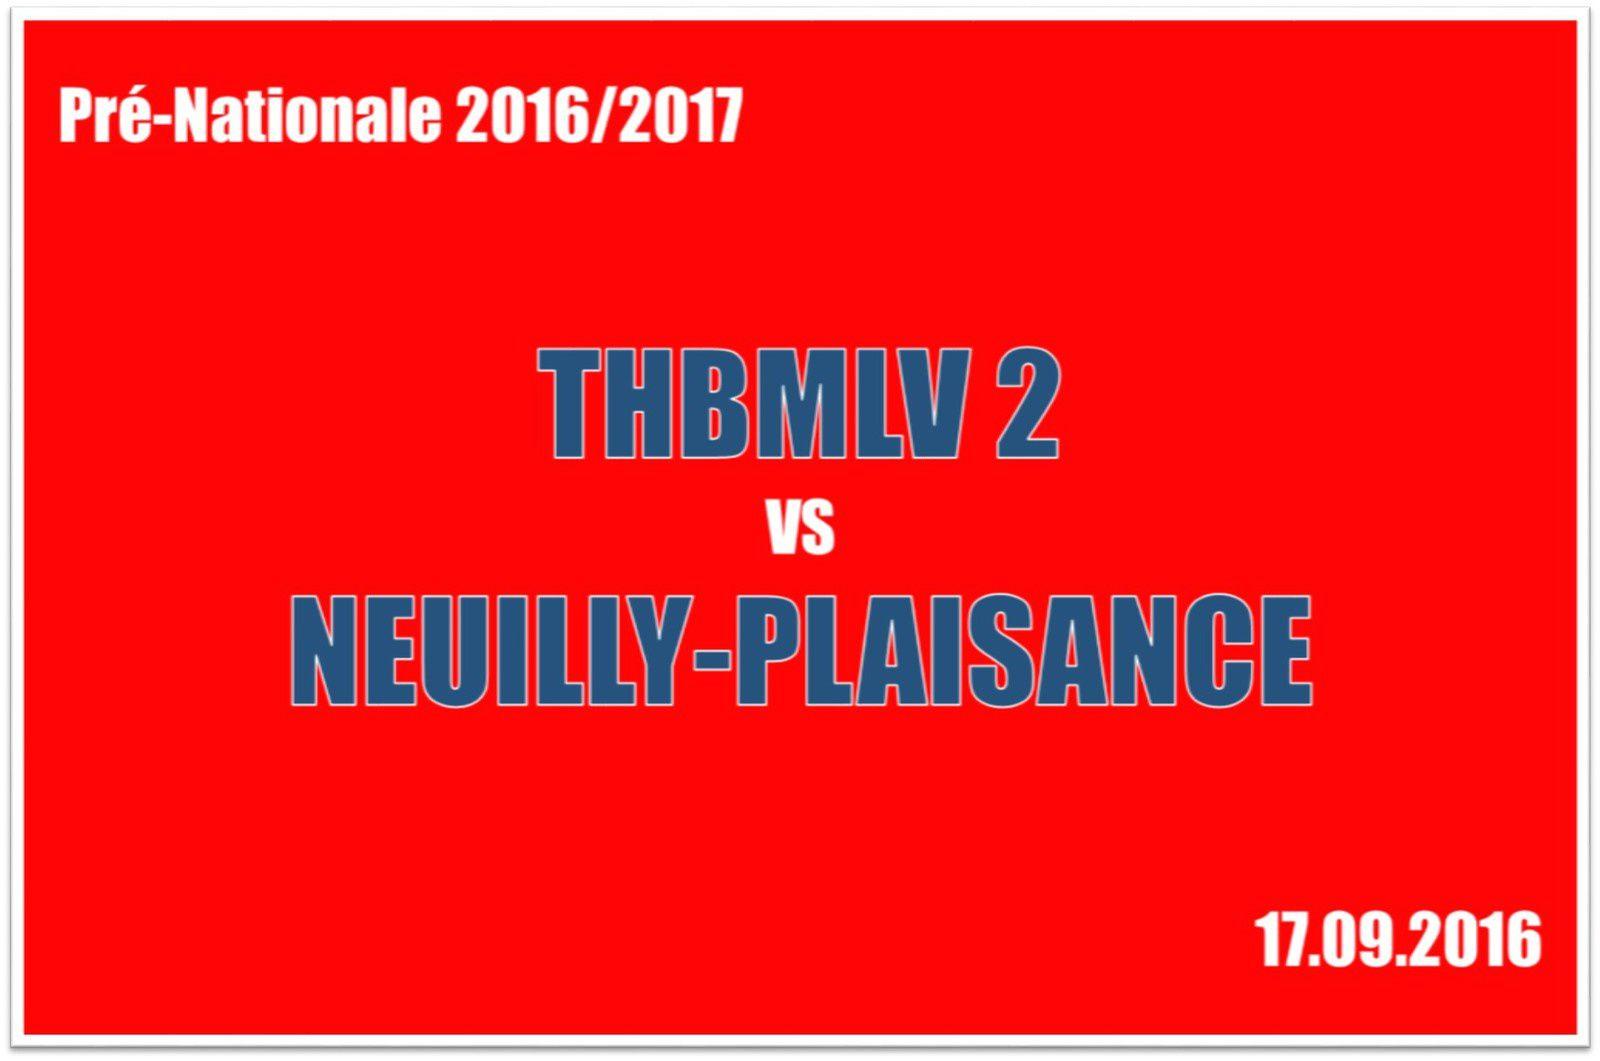 THBMLV 2 vs NEUILLY-PLAISANCE (Pré-Nationale) 17.09.2016